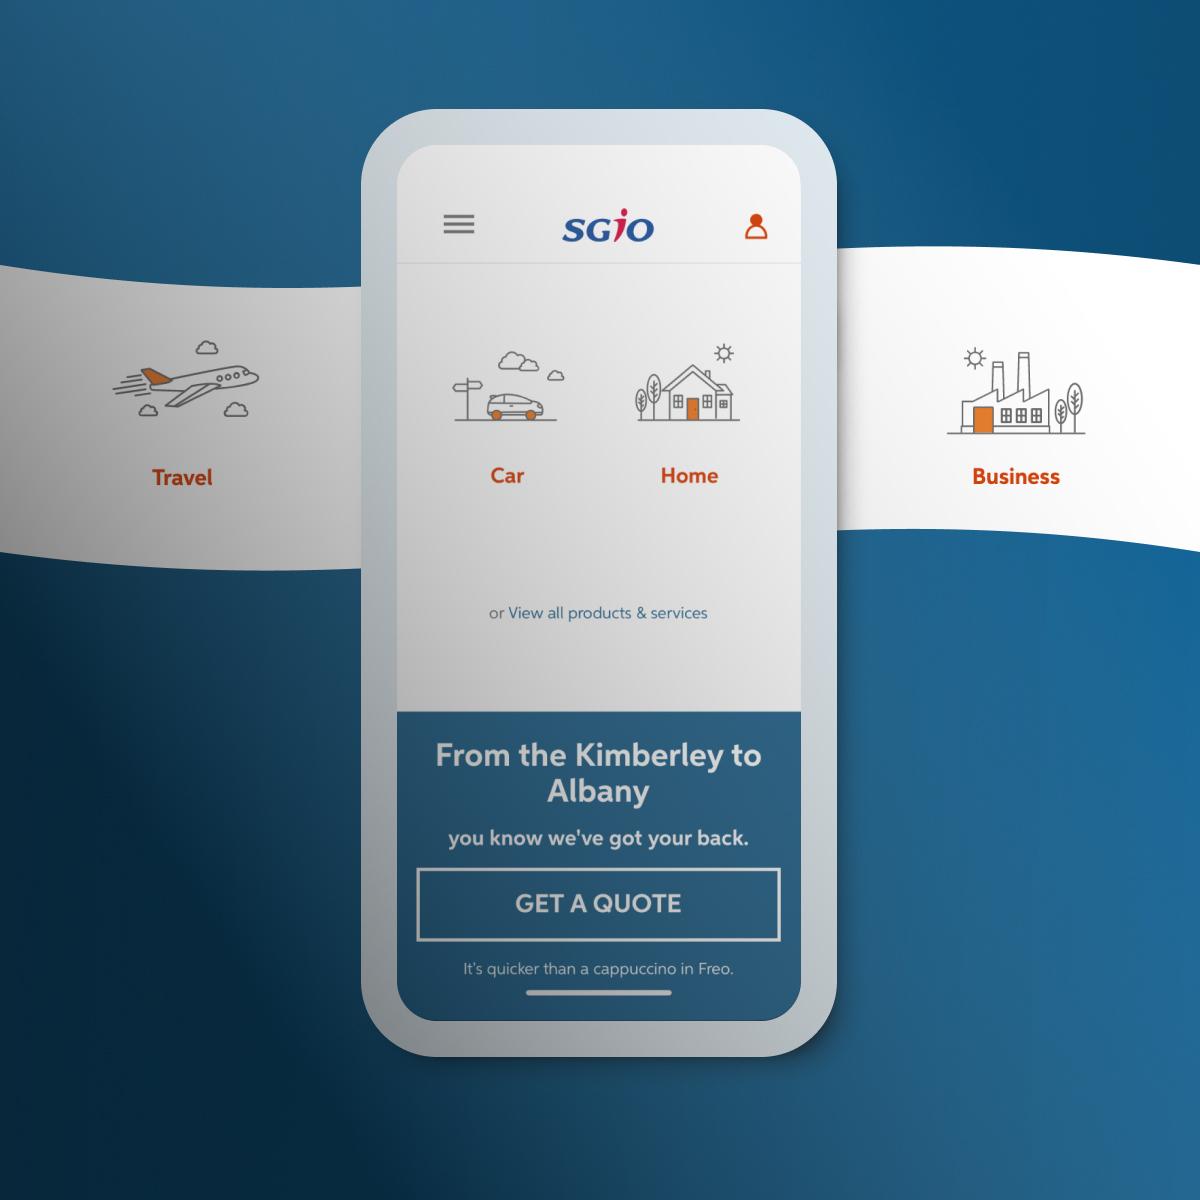 SGIO & SGIC